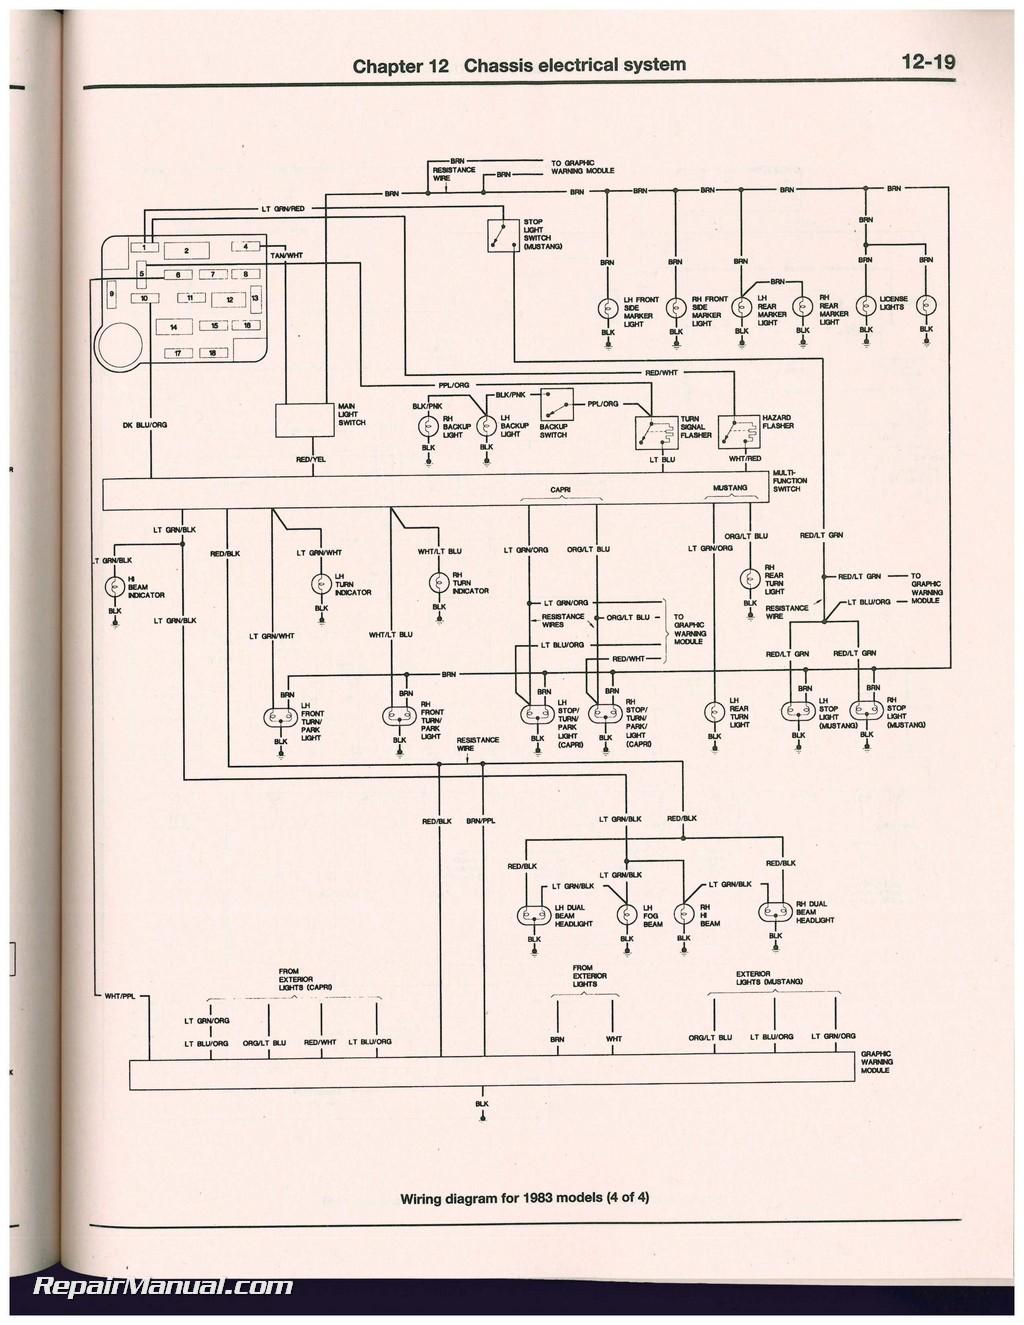 ford capri wiring diagram 1997 f250 radio oldsmobile achieva fuse box plymouth